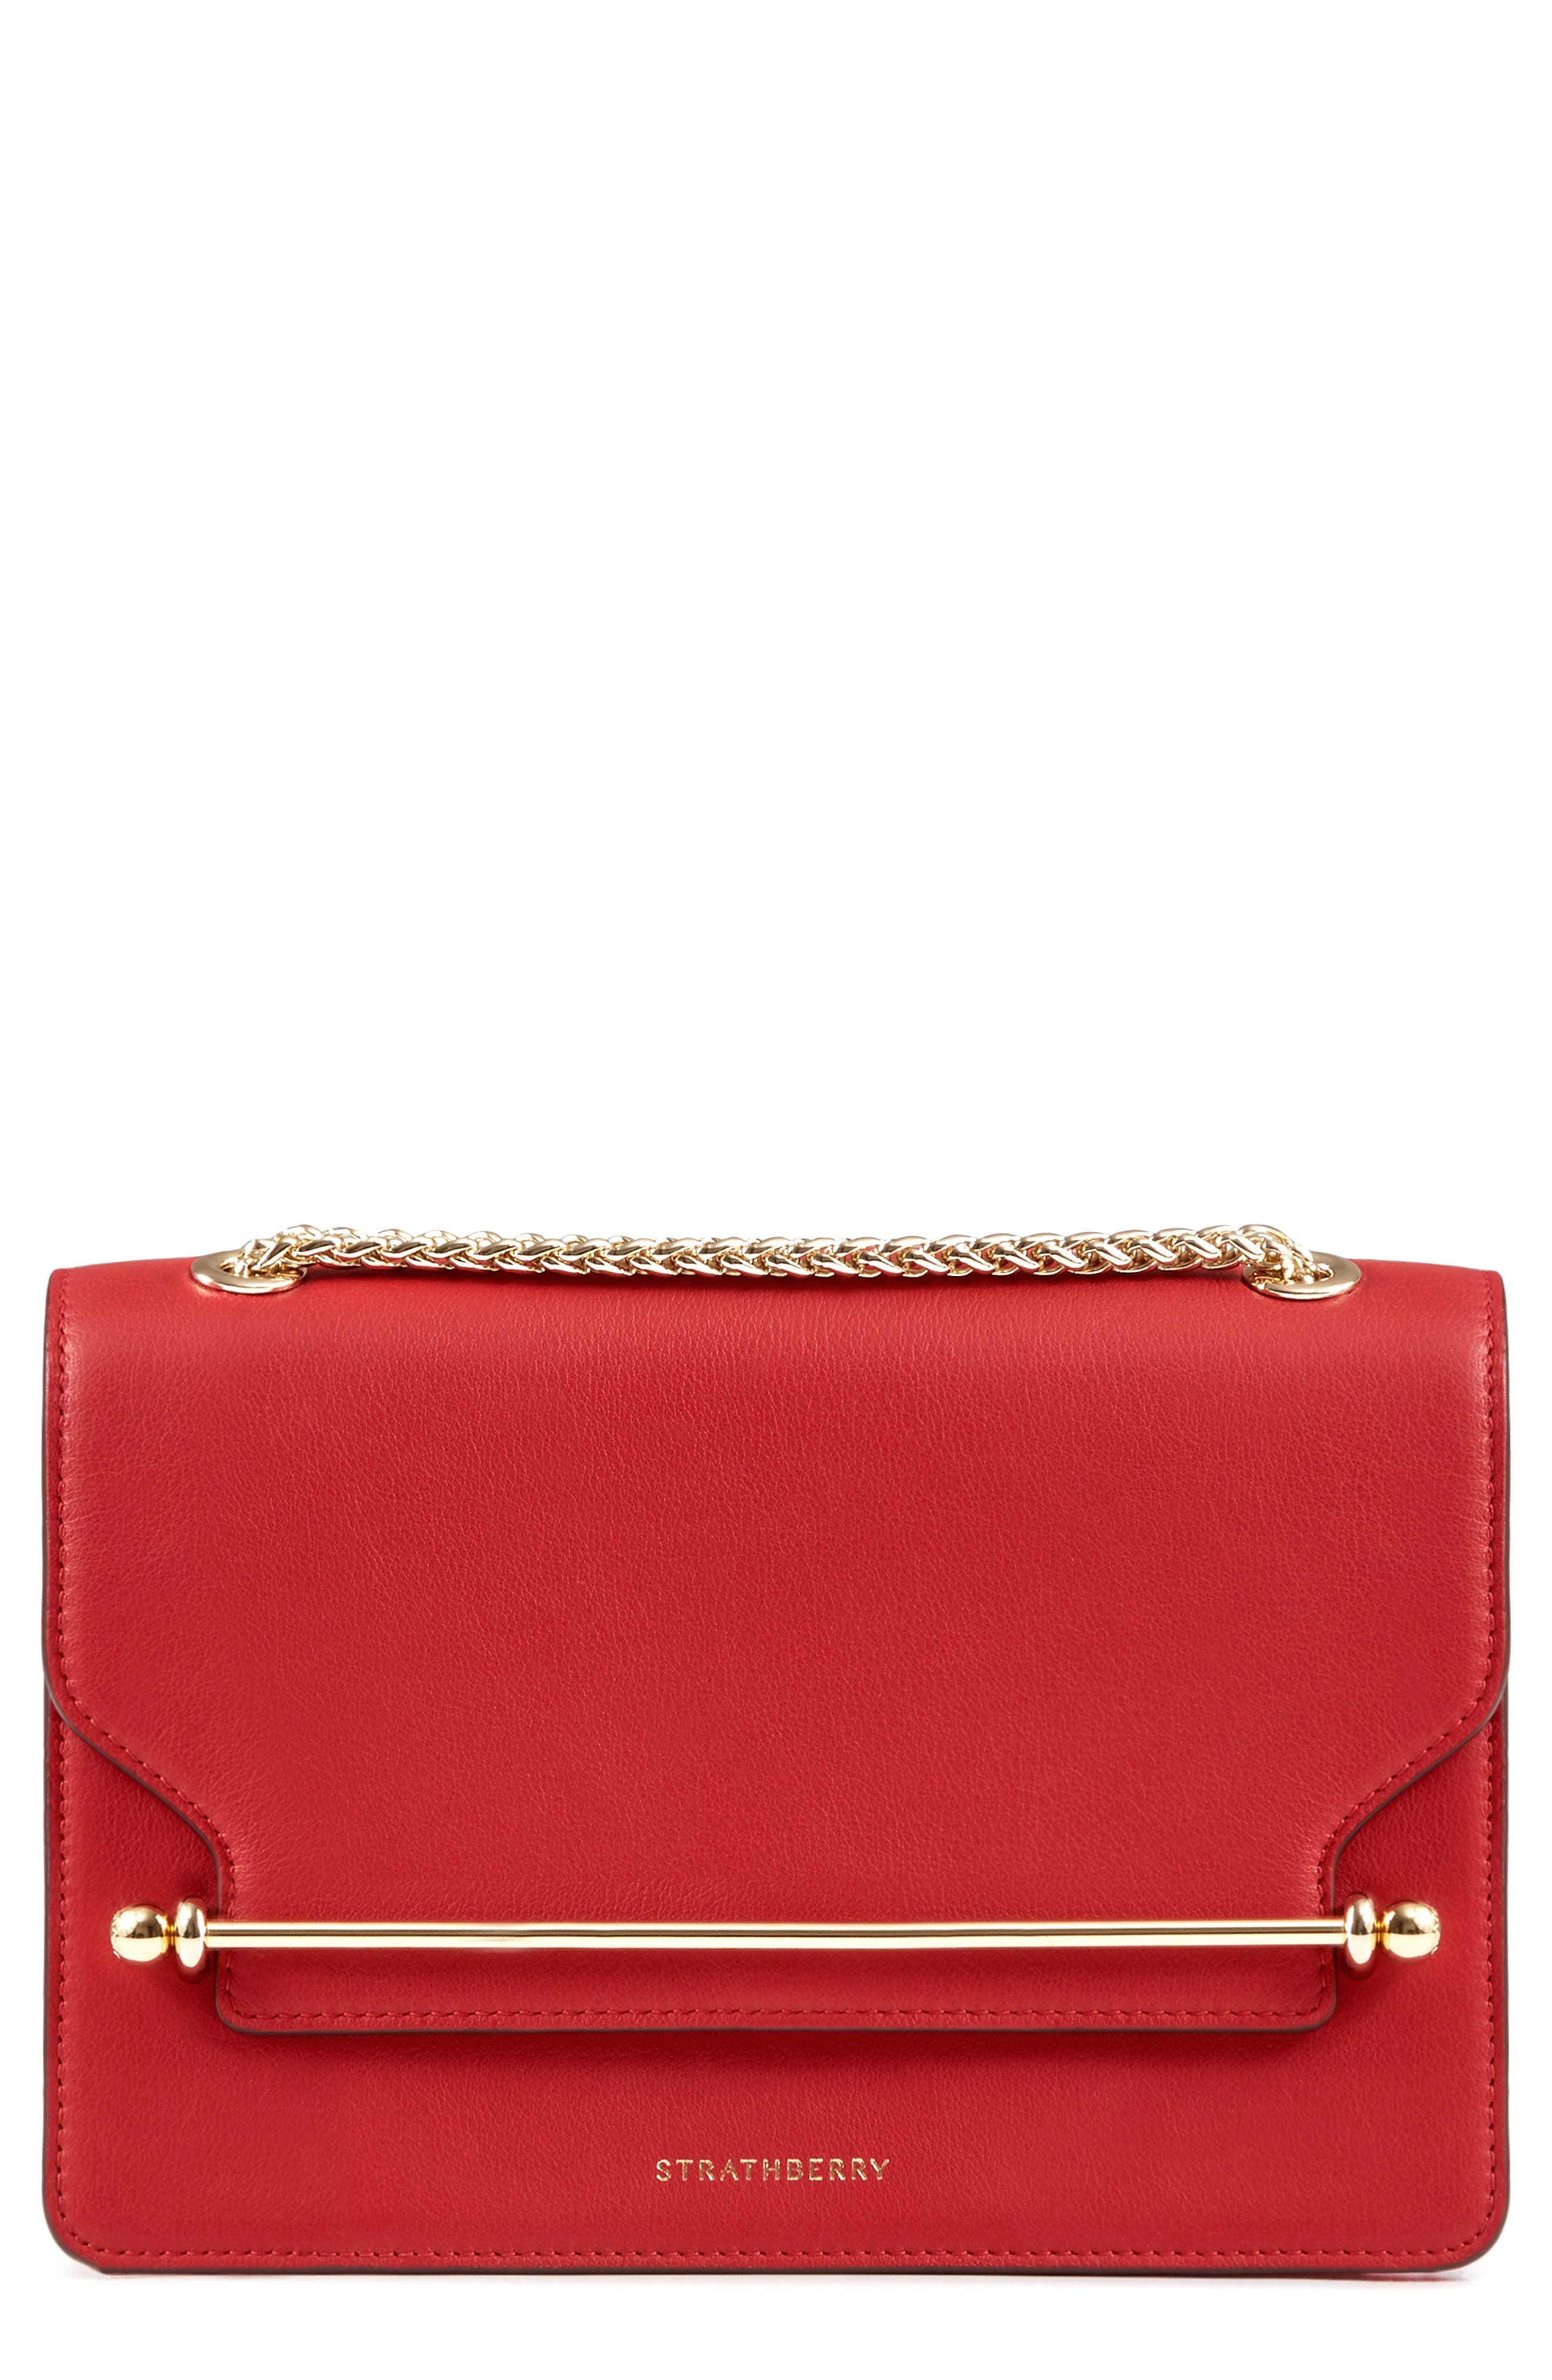 East/West Leather Crossbody Bag,                             Main thumbnail 3, color,